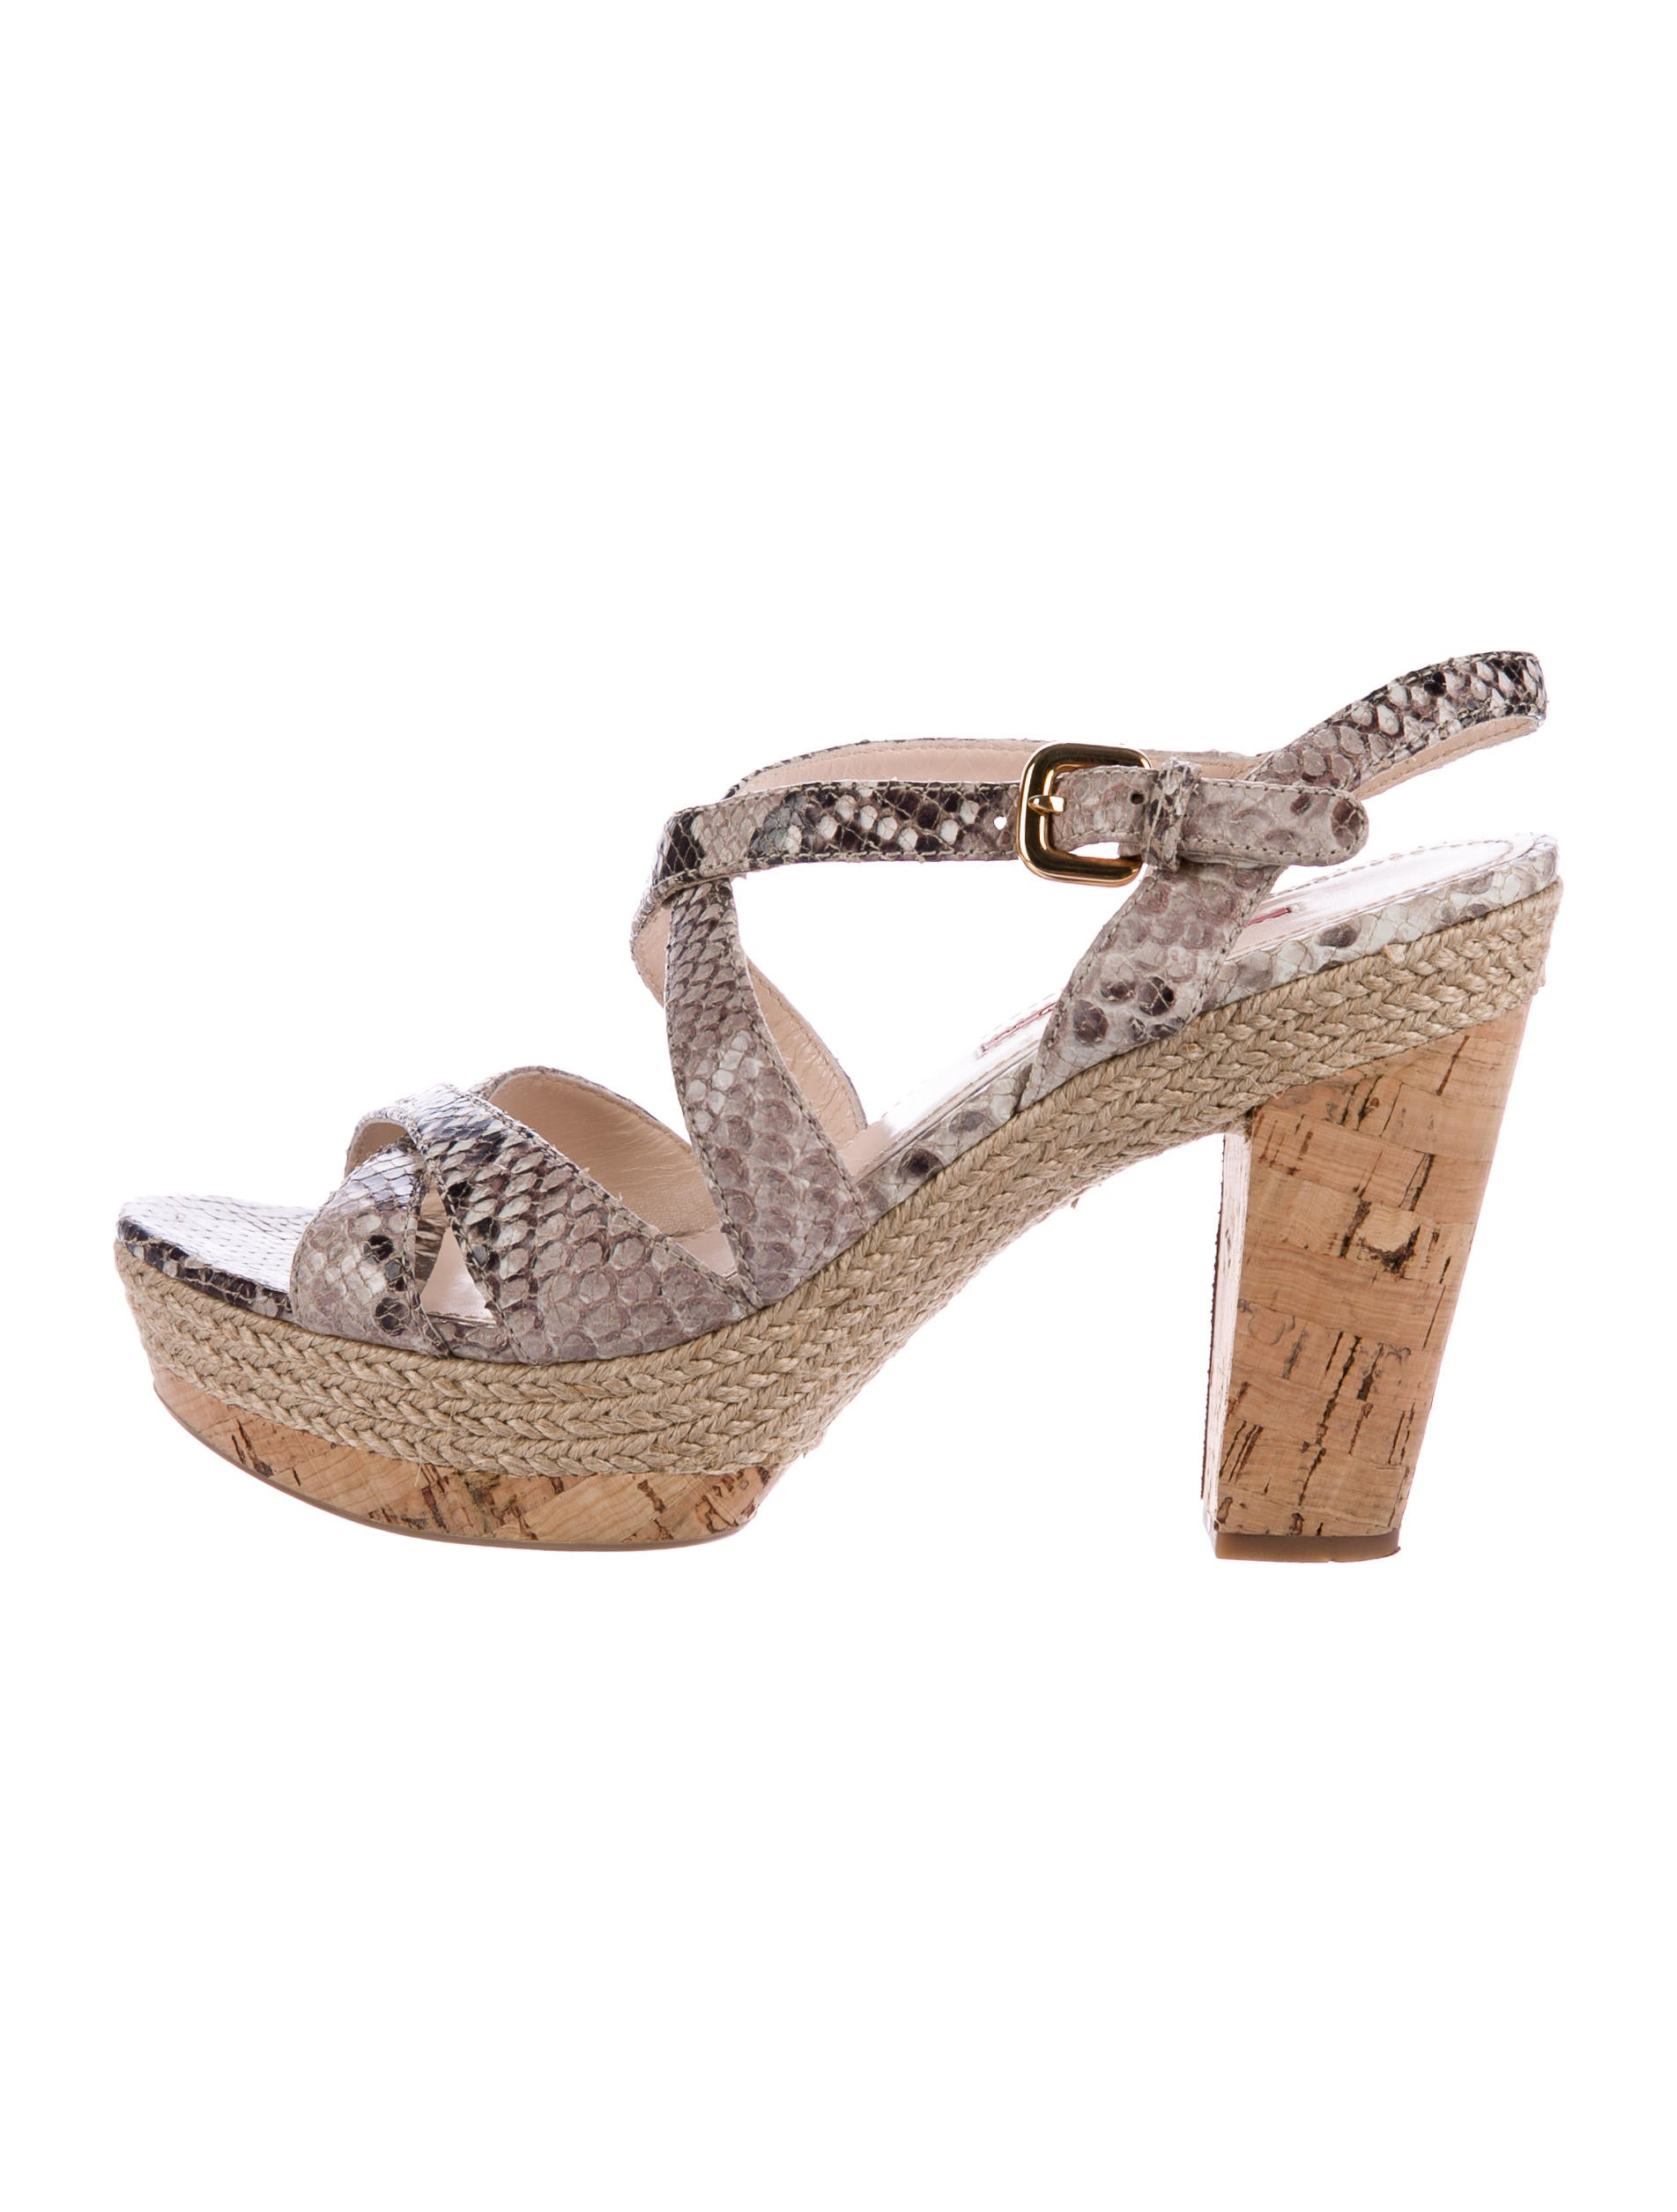 Prada Sport Platform Crossover Sandals big sale online yRRqD